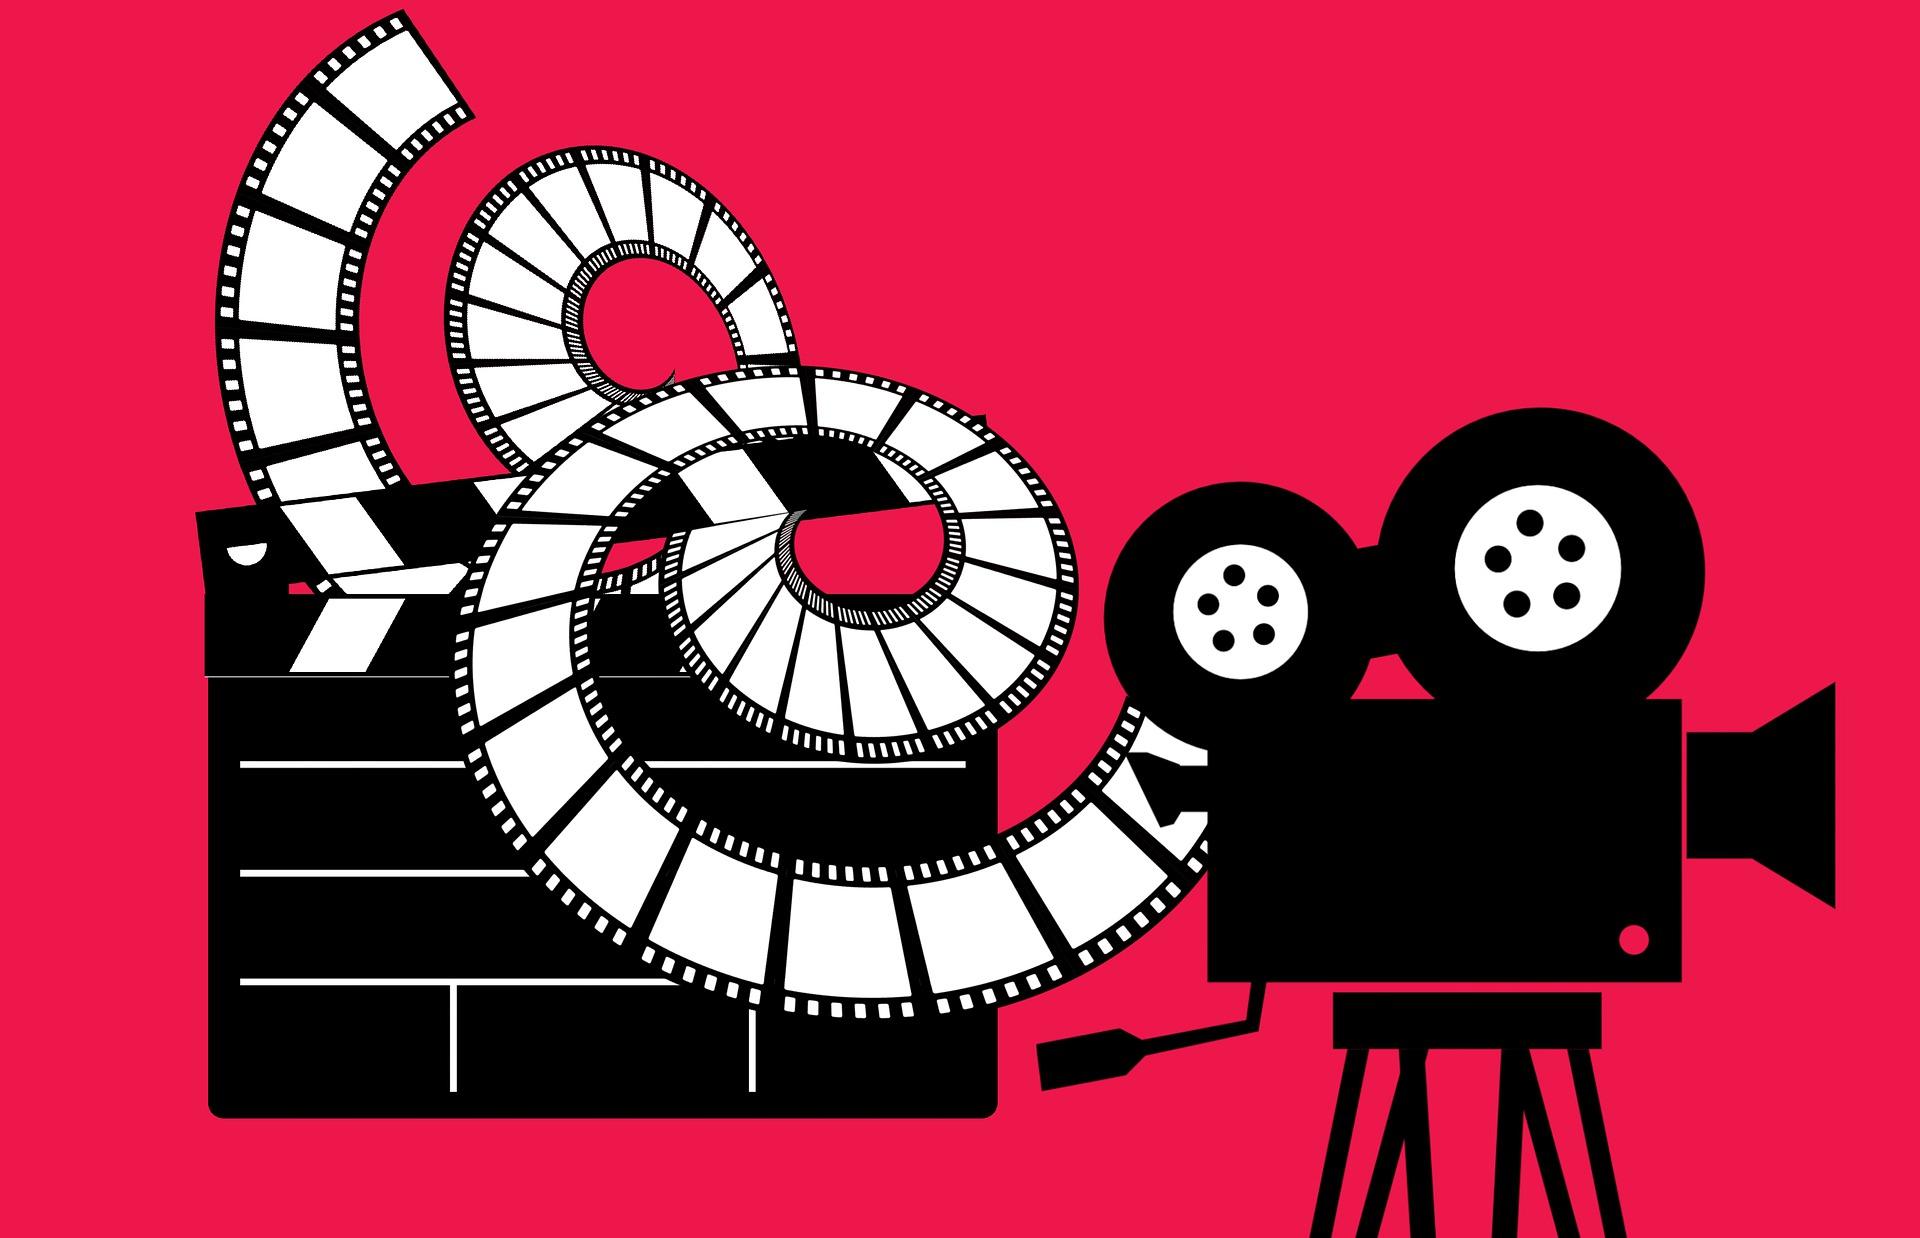 curso de cinematografia